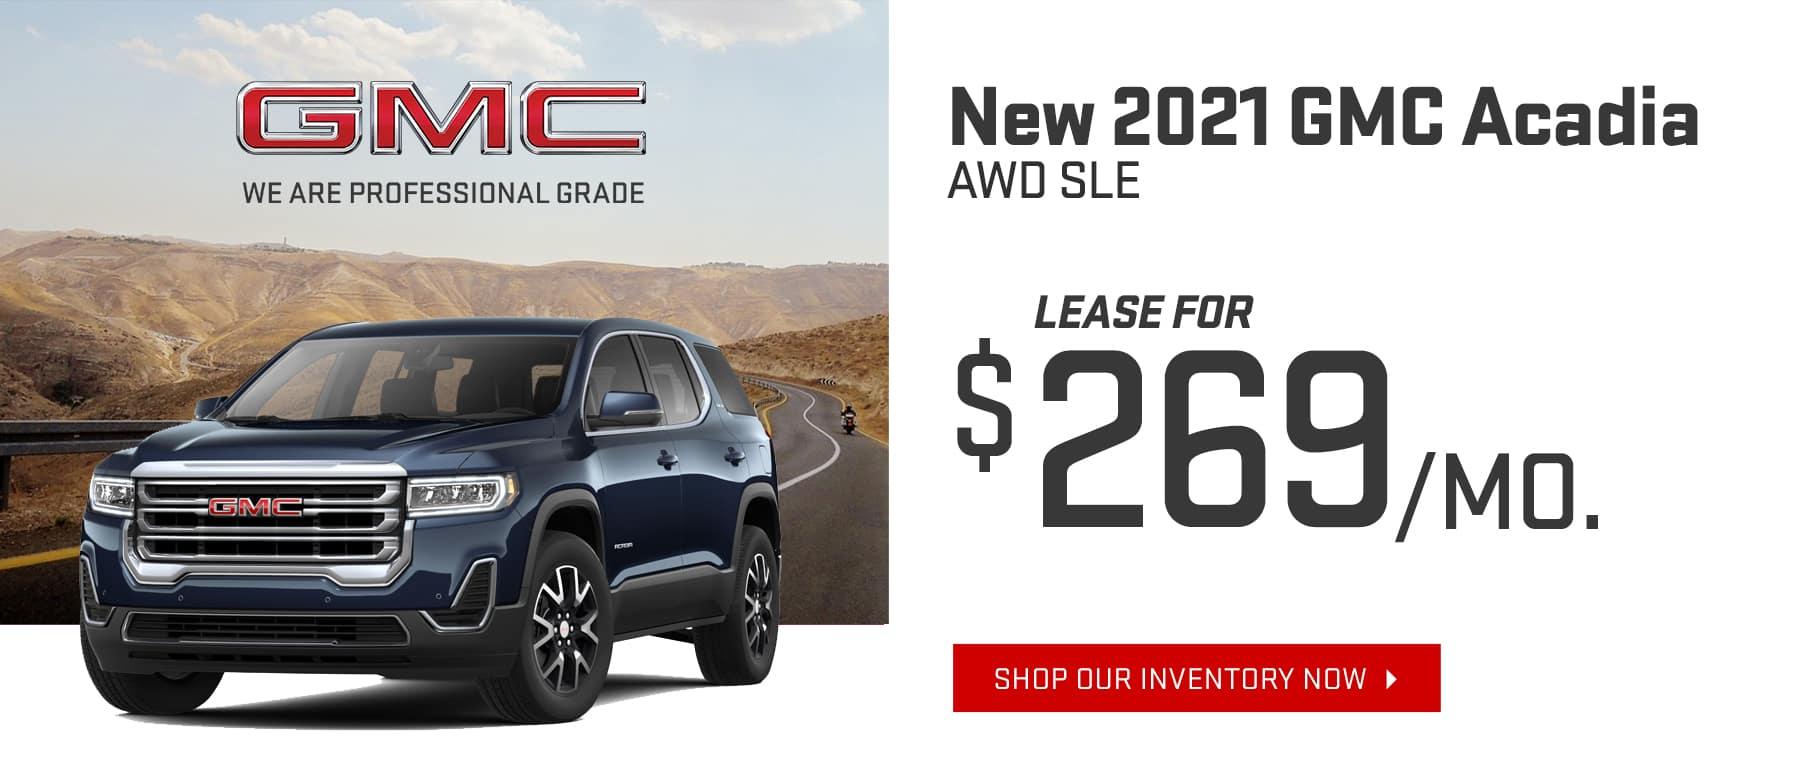 HURD_1800x760_New 2021 GMC Acadia AWD SLE-0521